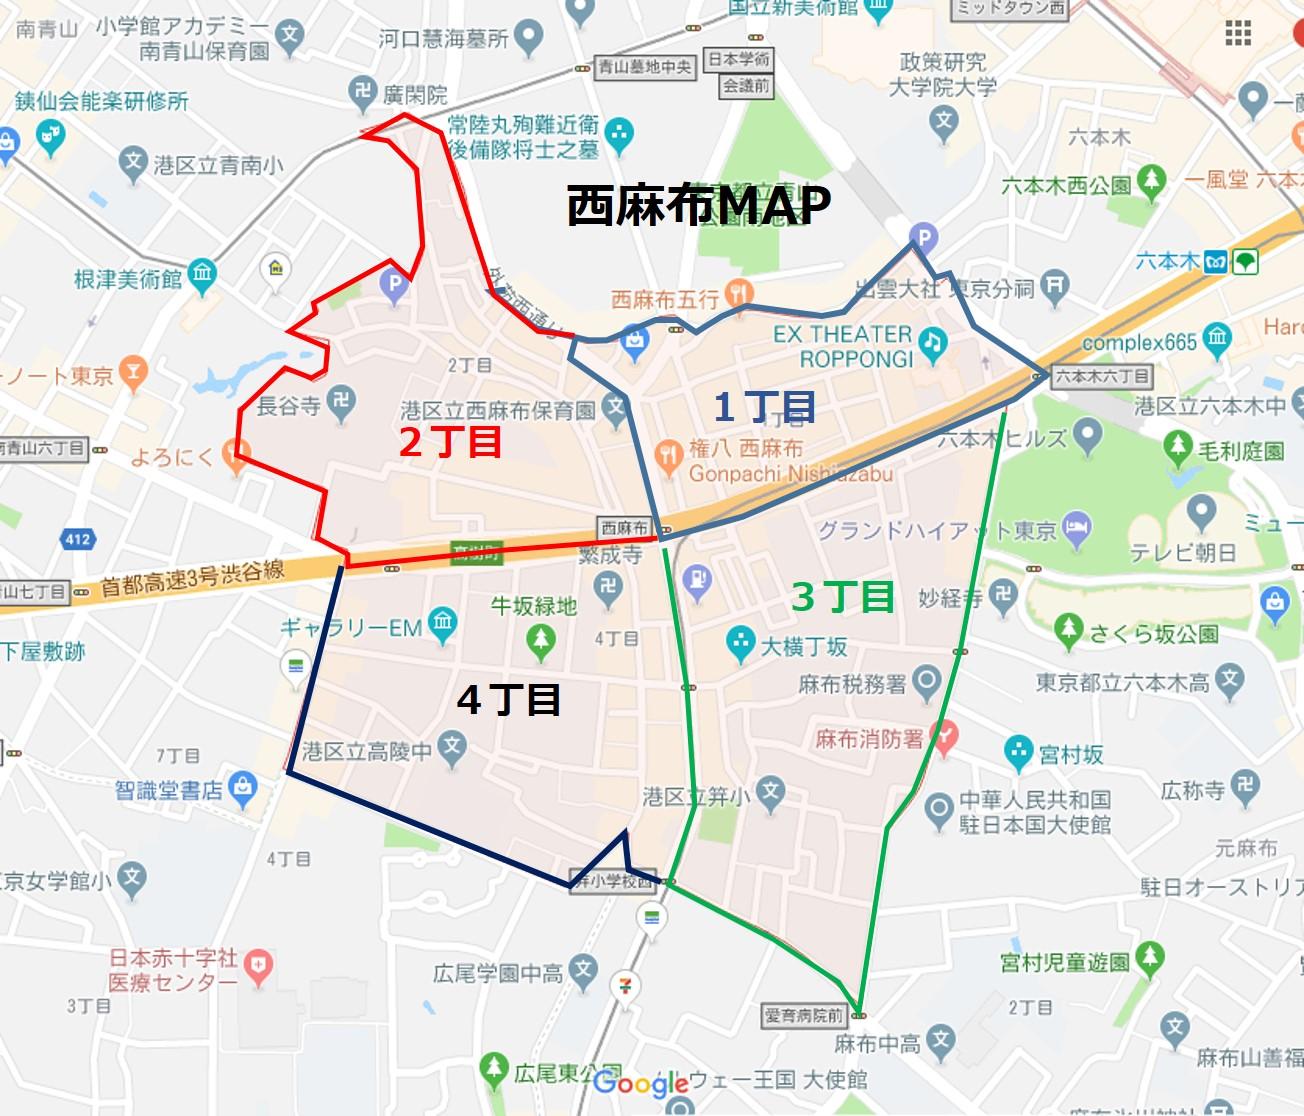 西麻布MAP2